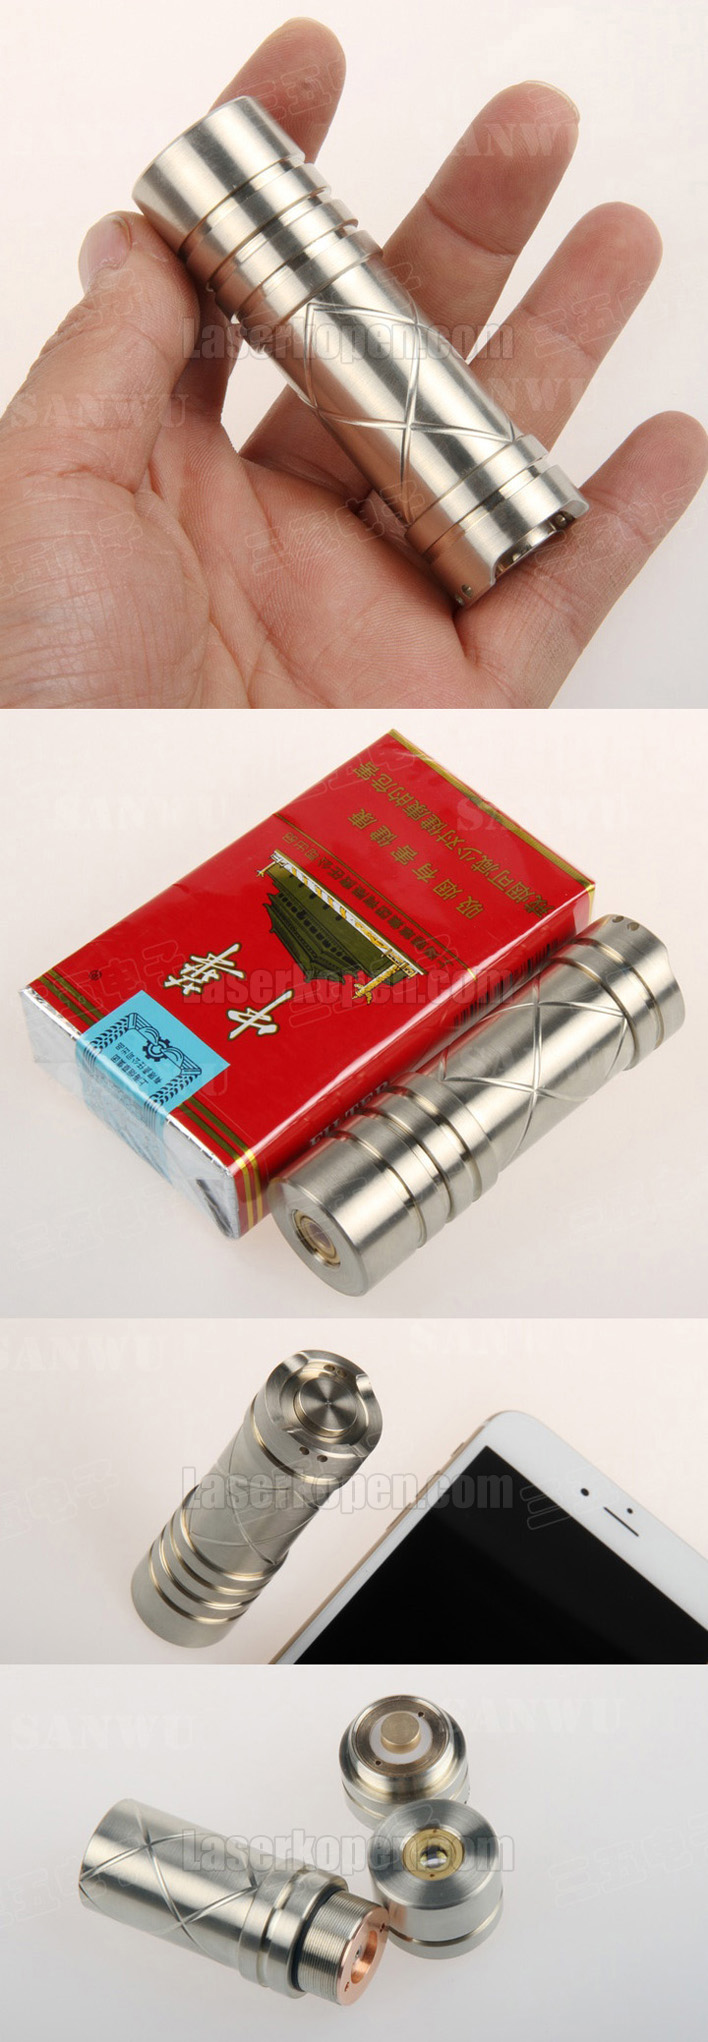 500mW groene laser